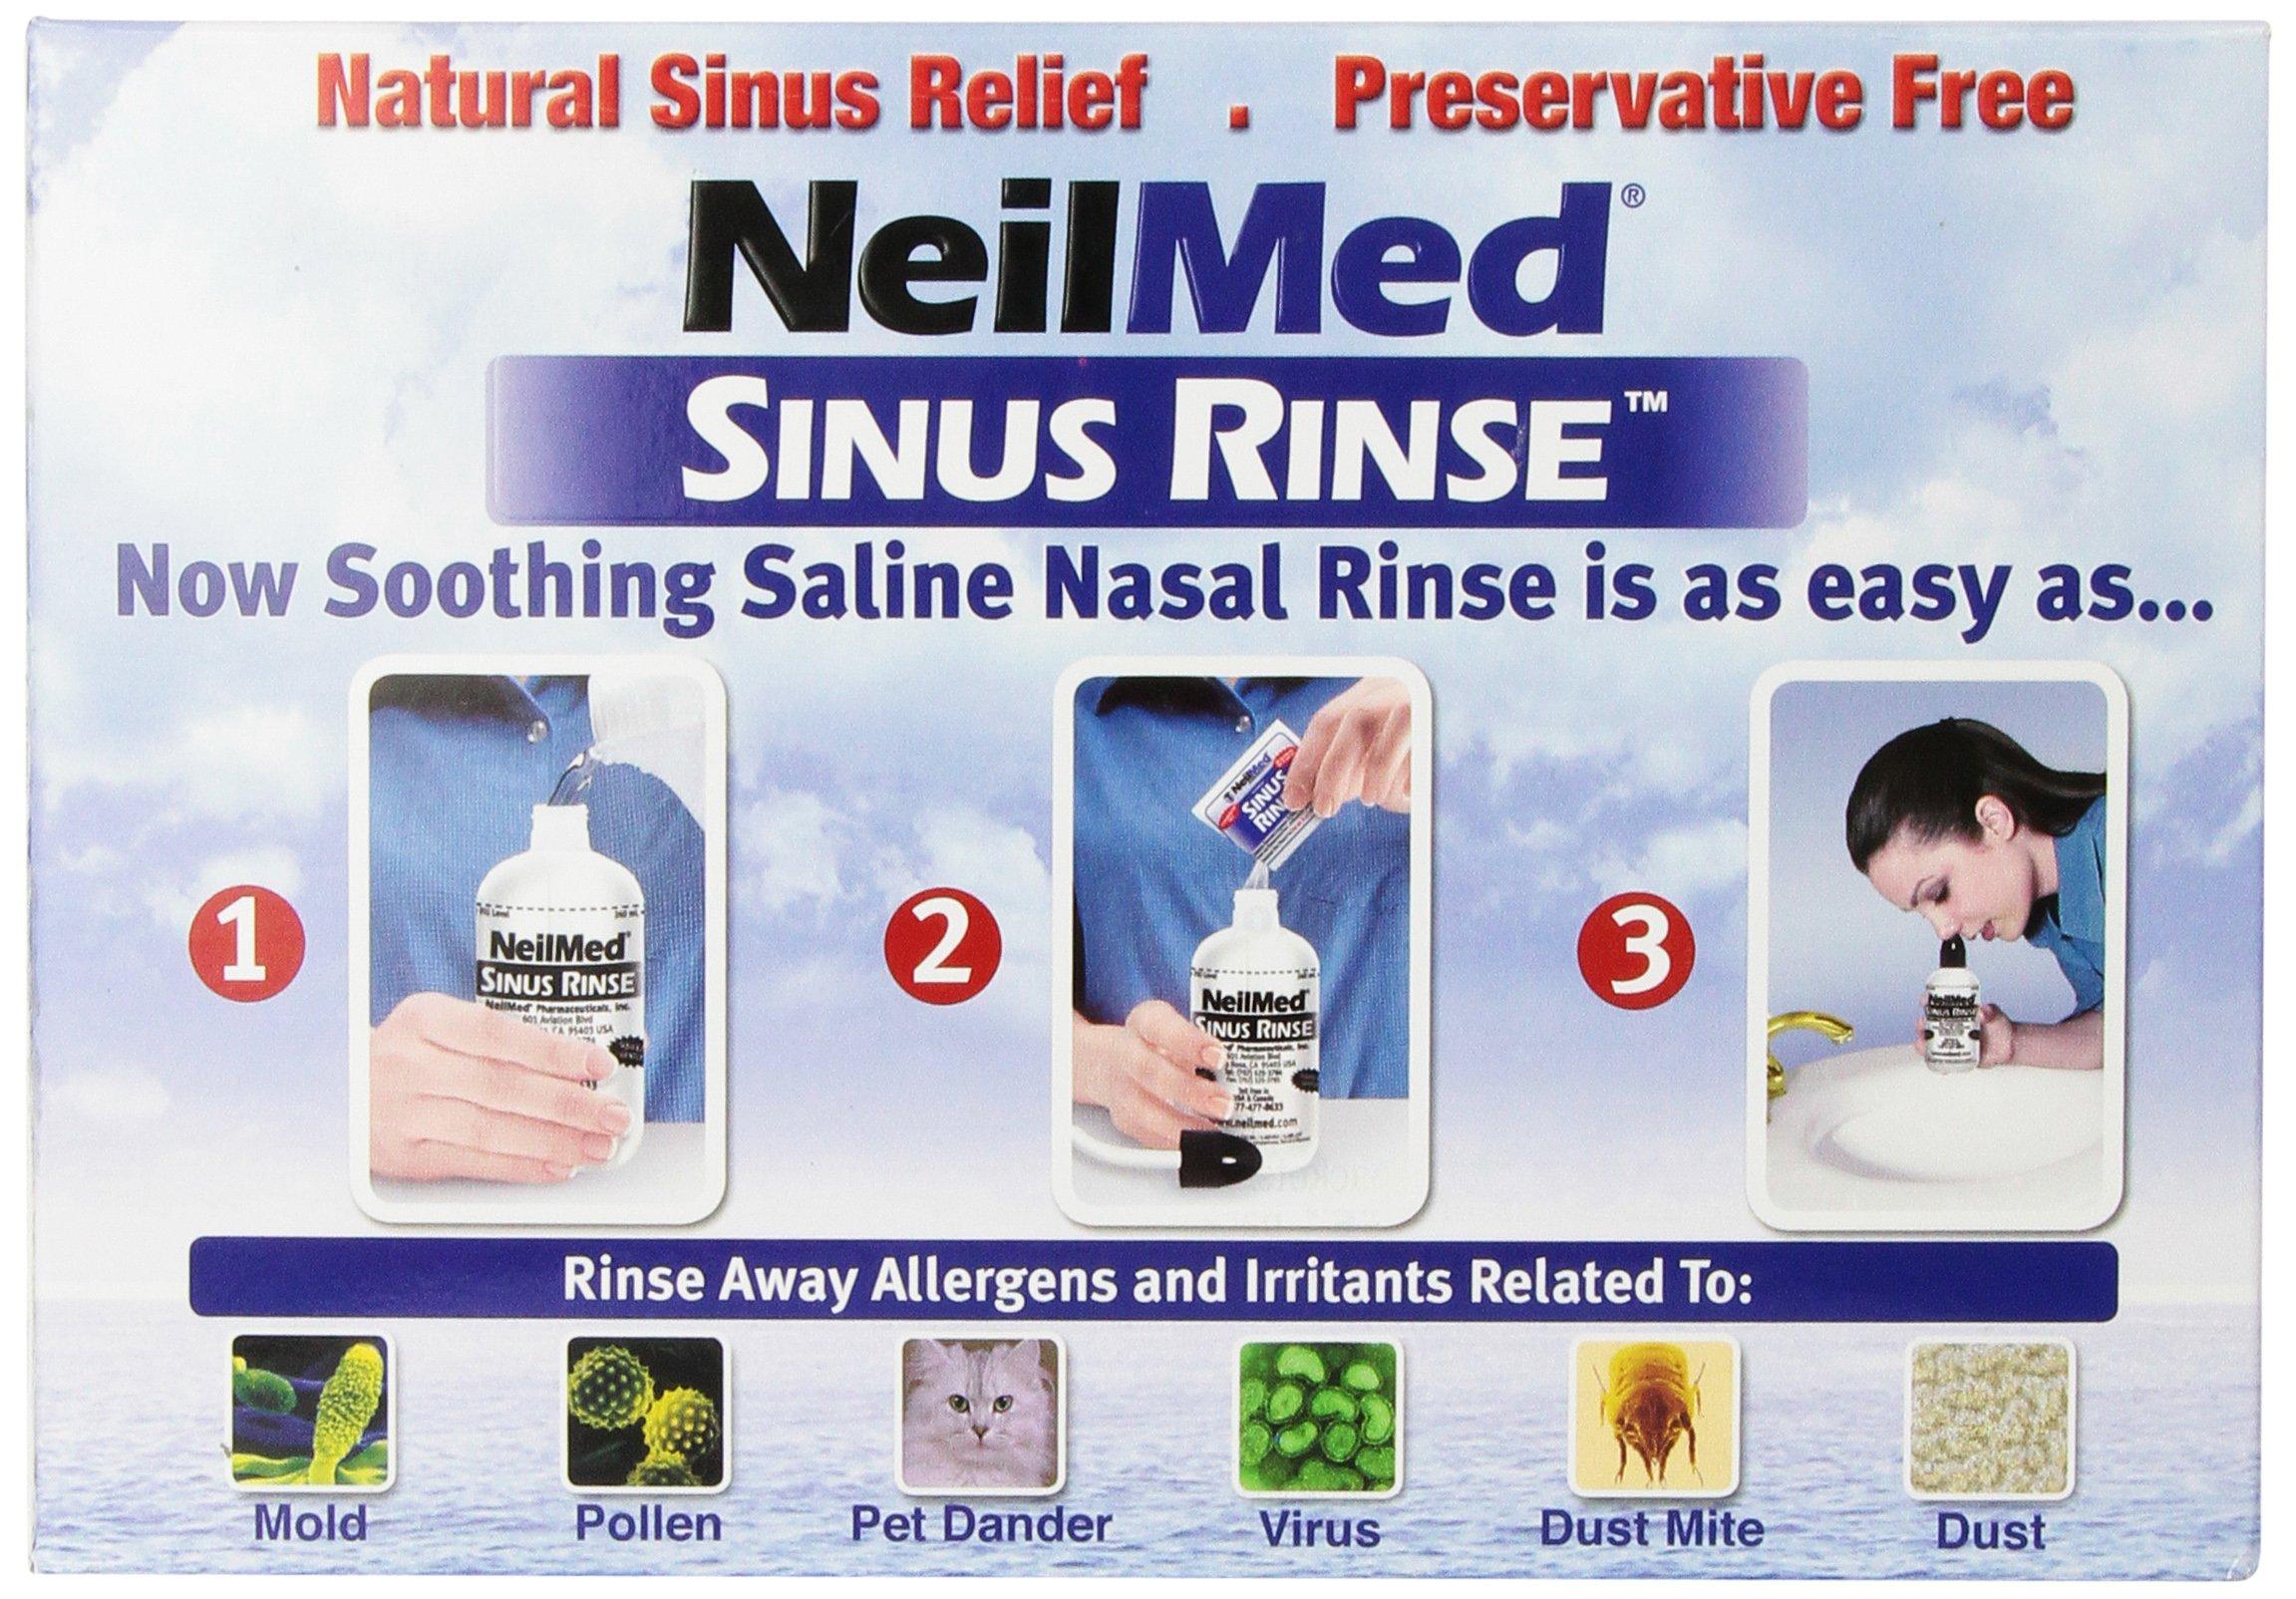 NeilMed Sinus Rinse - 2 squeeze Bottles 240mL (8fl oz) & Nasamist Saline Spray 75mL - 250 Premixed Packets - BONUS Nasa Mist Saline Spray - Value Pack by NeilMed